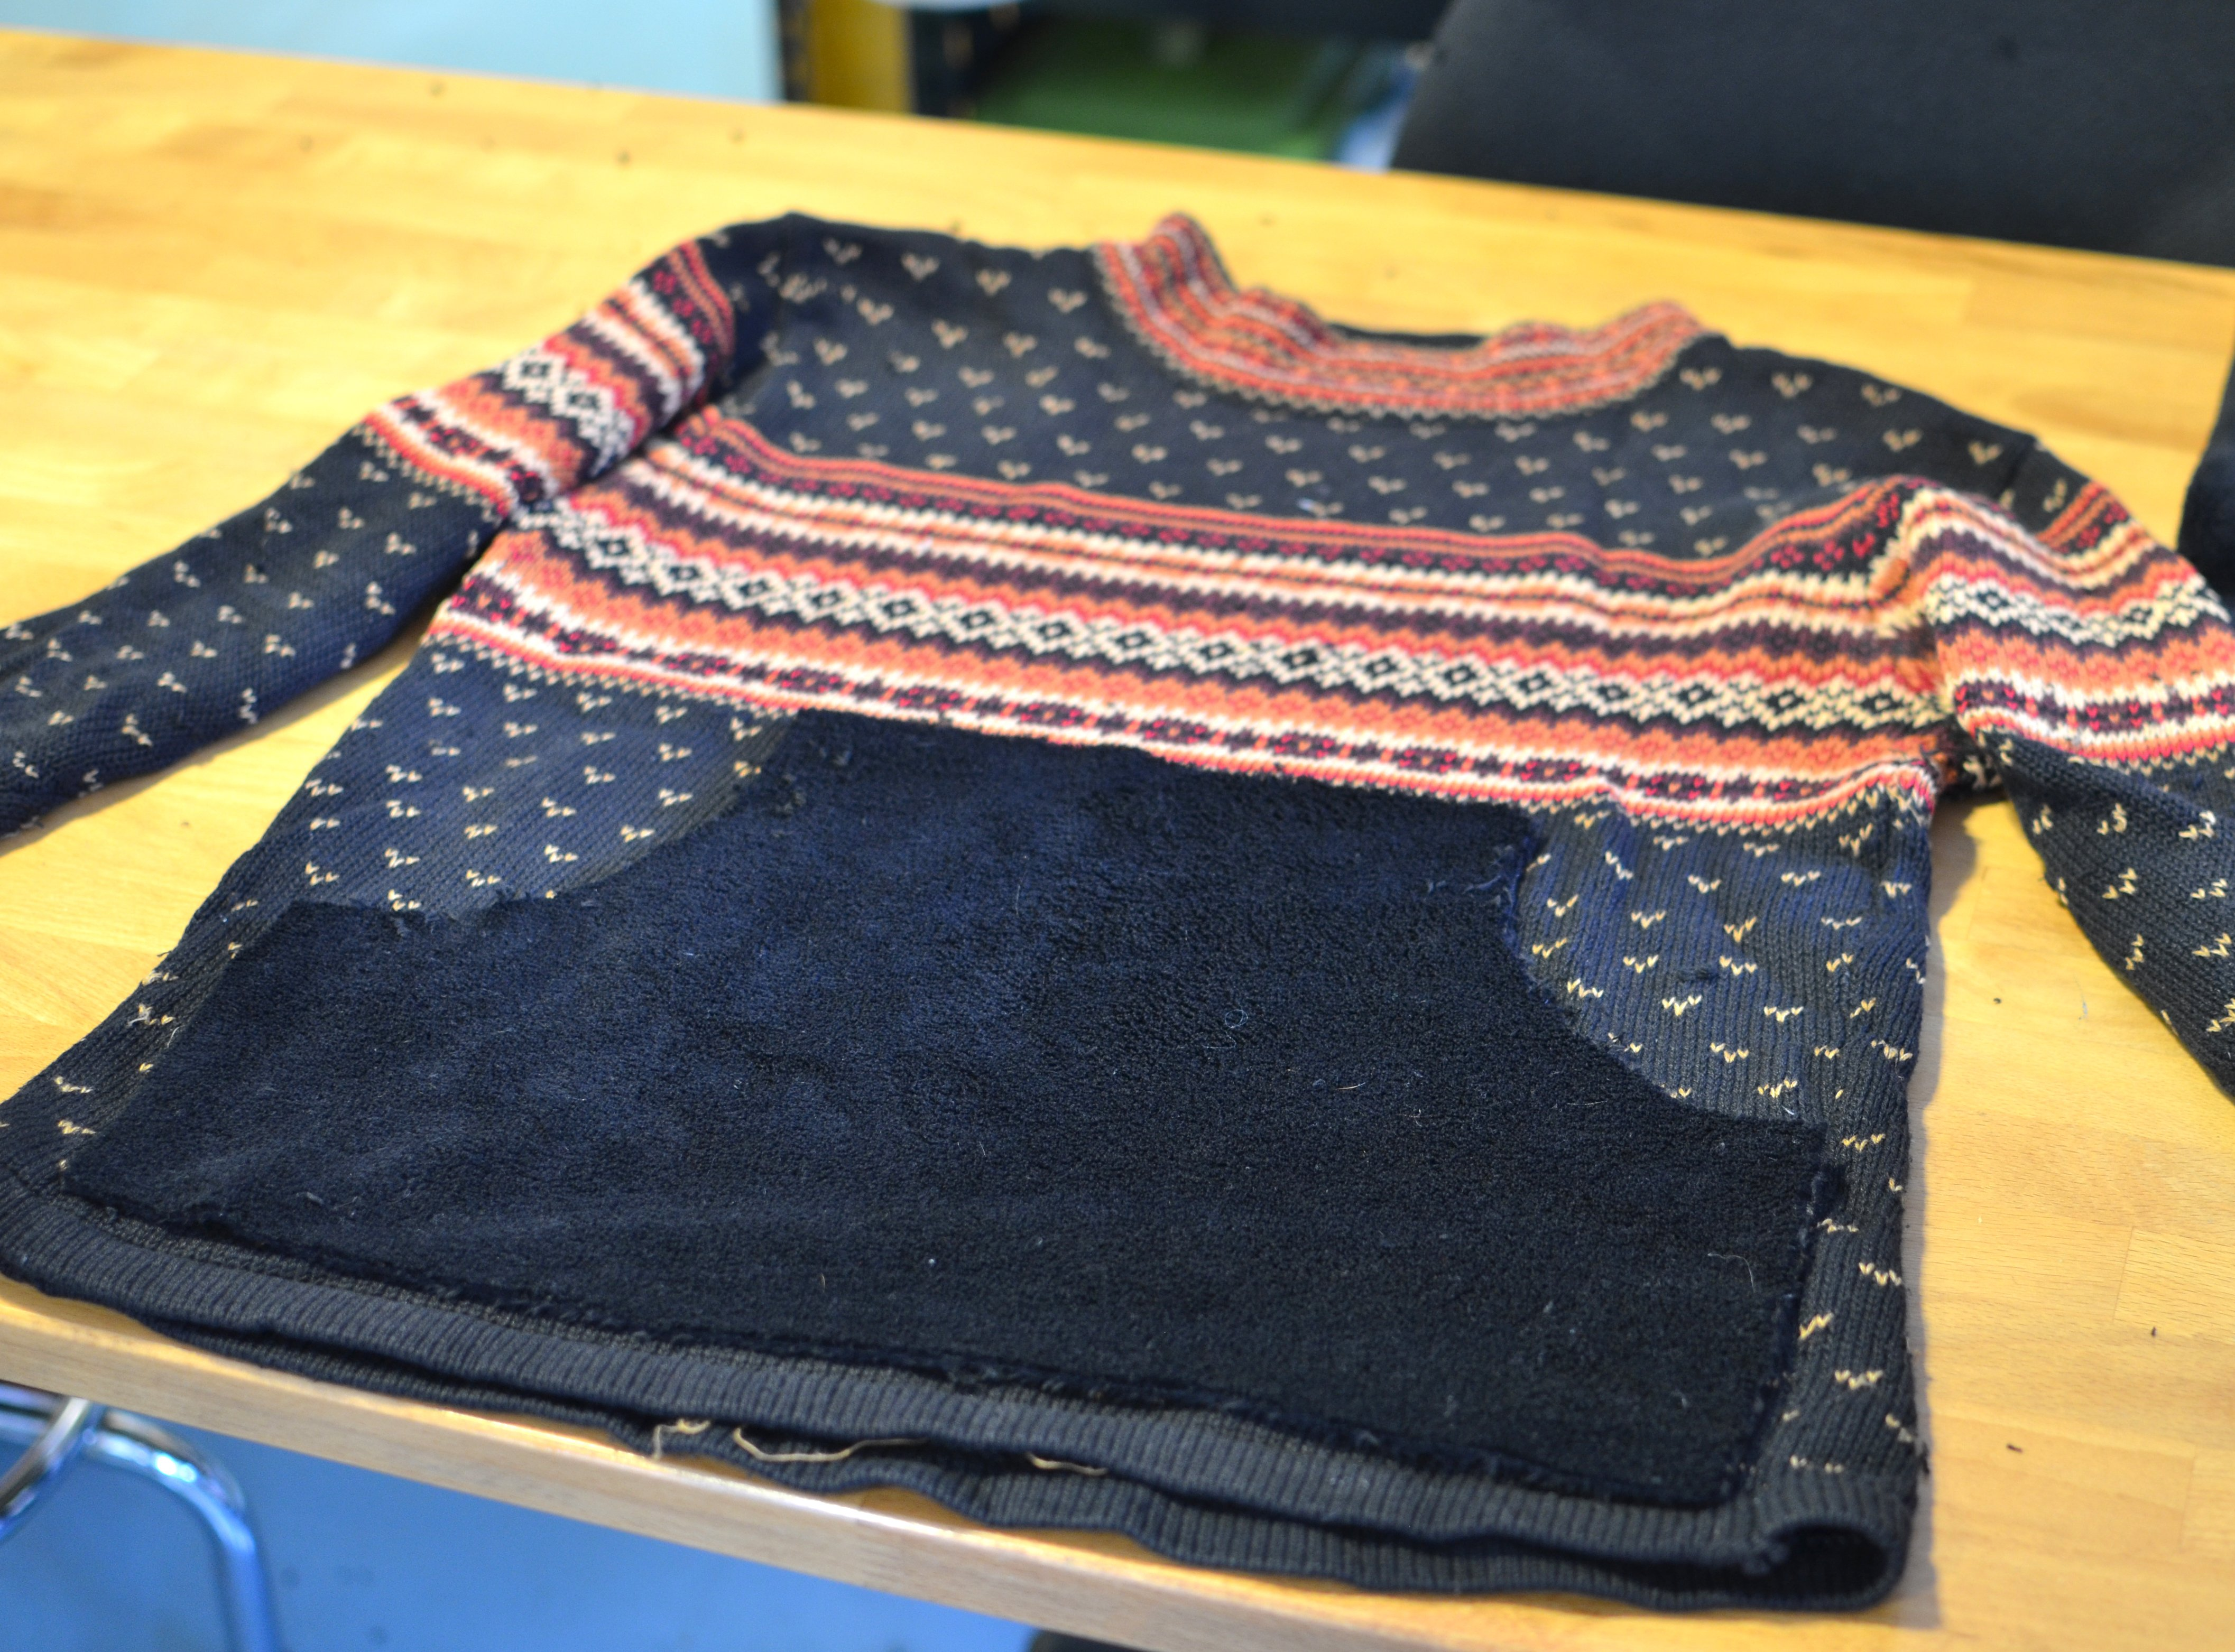 adafruit_products_lous-xmas-sweater-mod-04.jpg